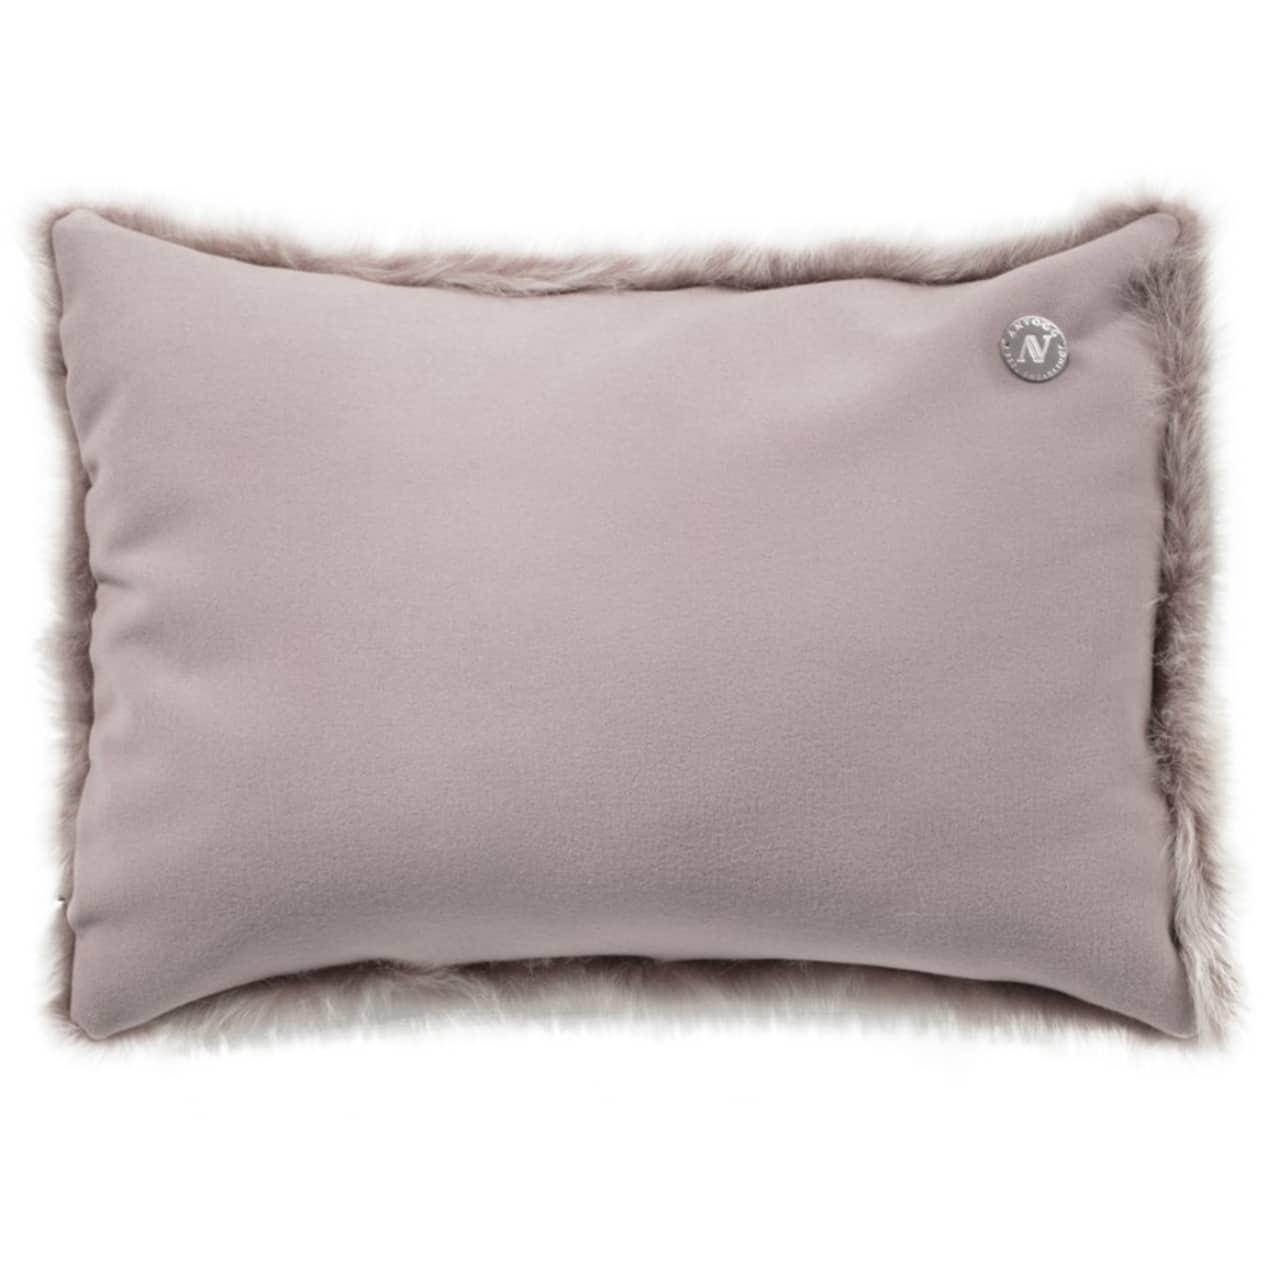 NEW-Shearling Pillow- Topo- 35x55cm (SPTOPTO3555) arka - ANVOGG FEEL SHEARLING | ANVOGG